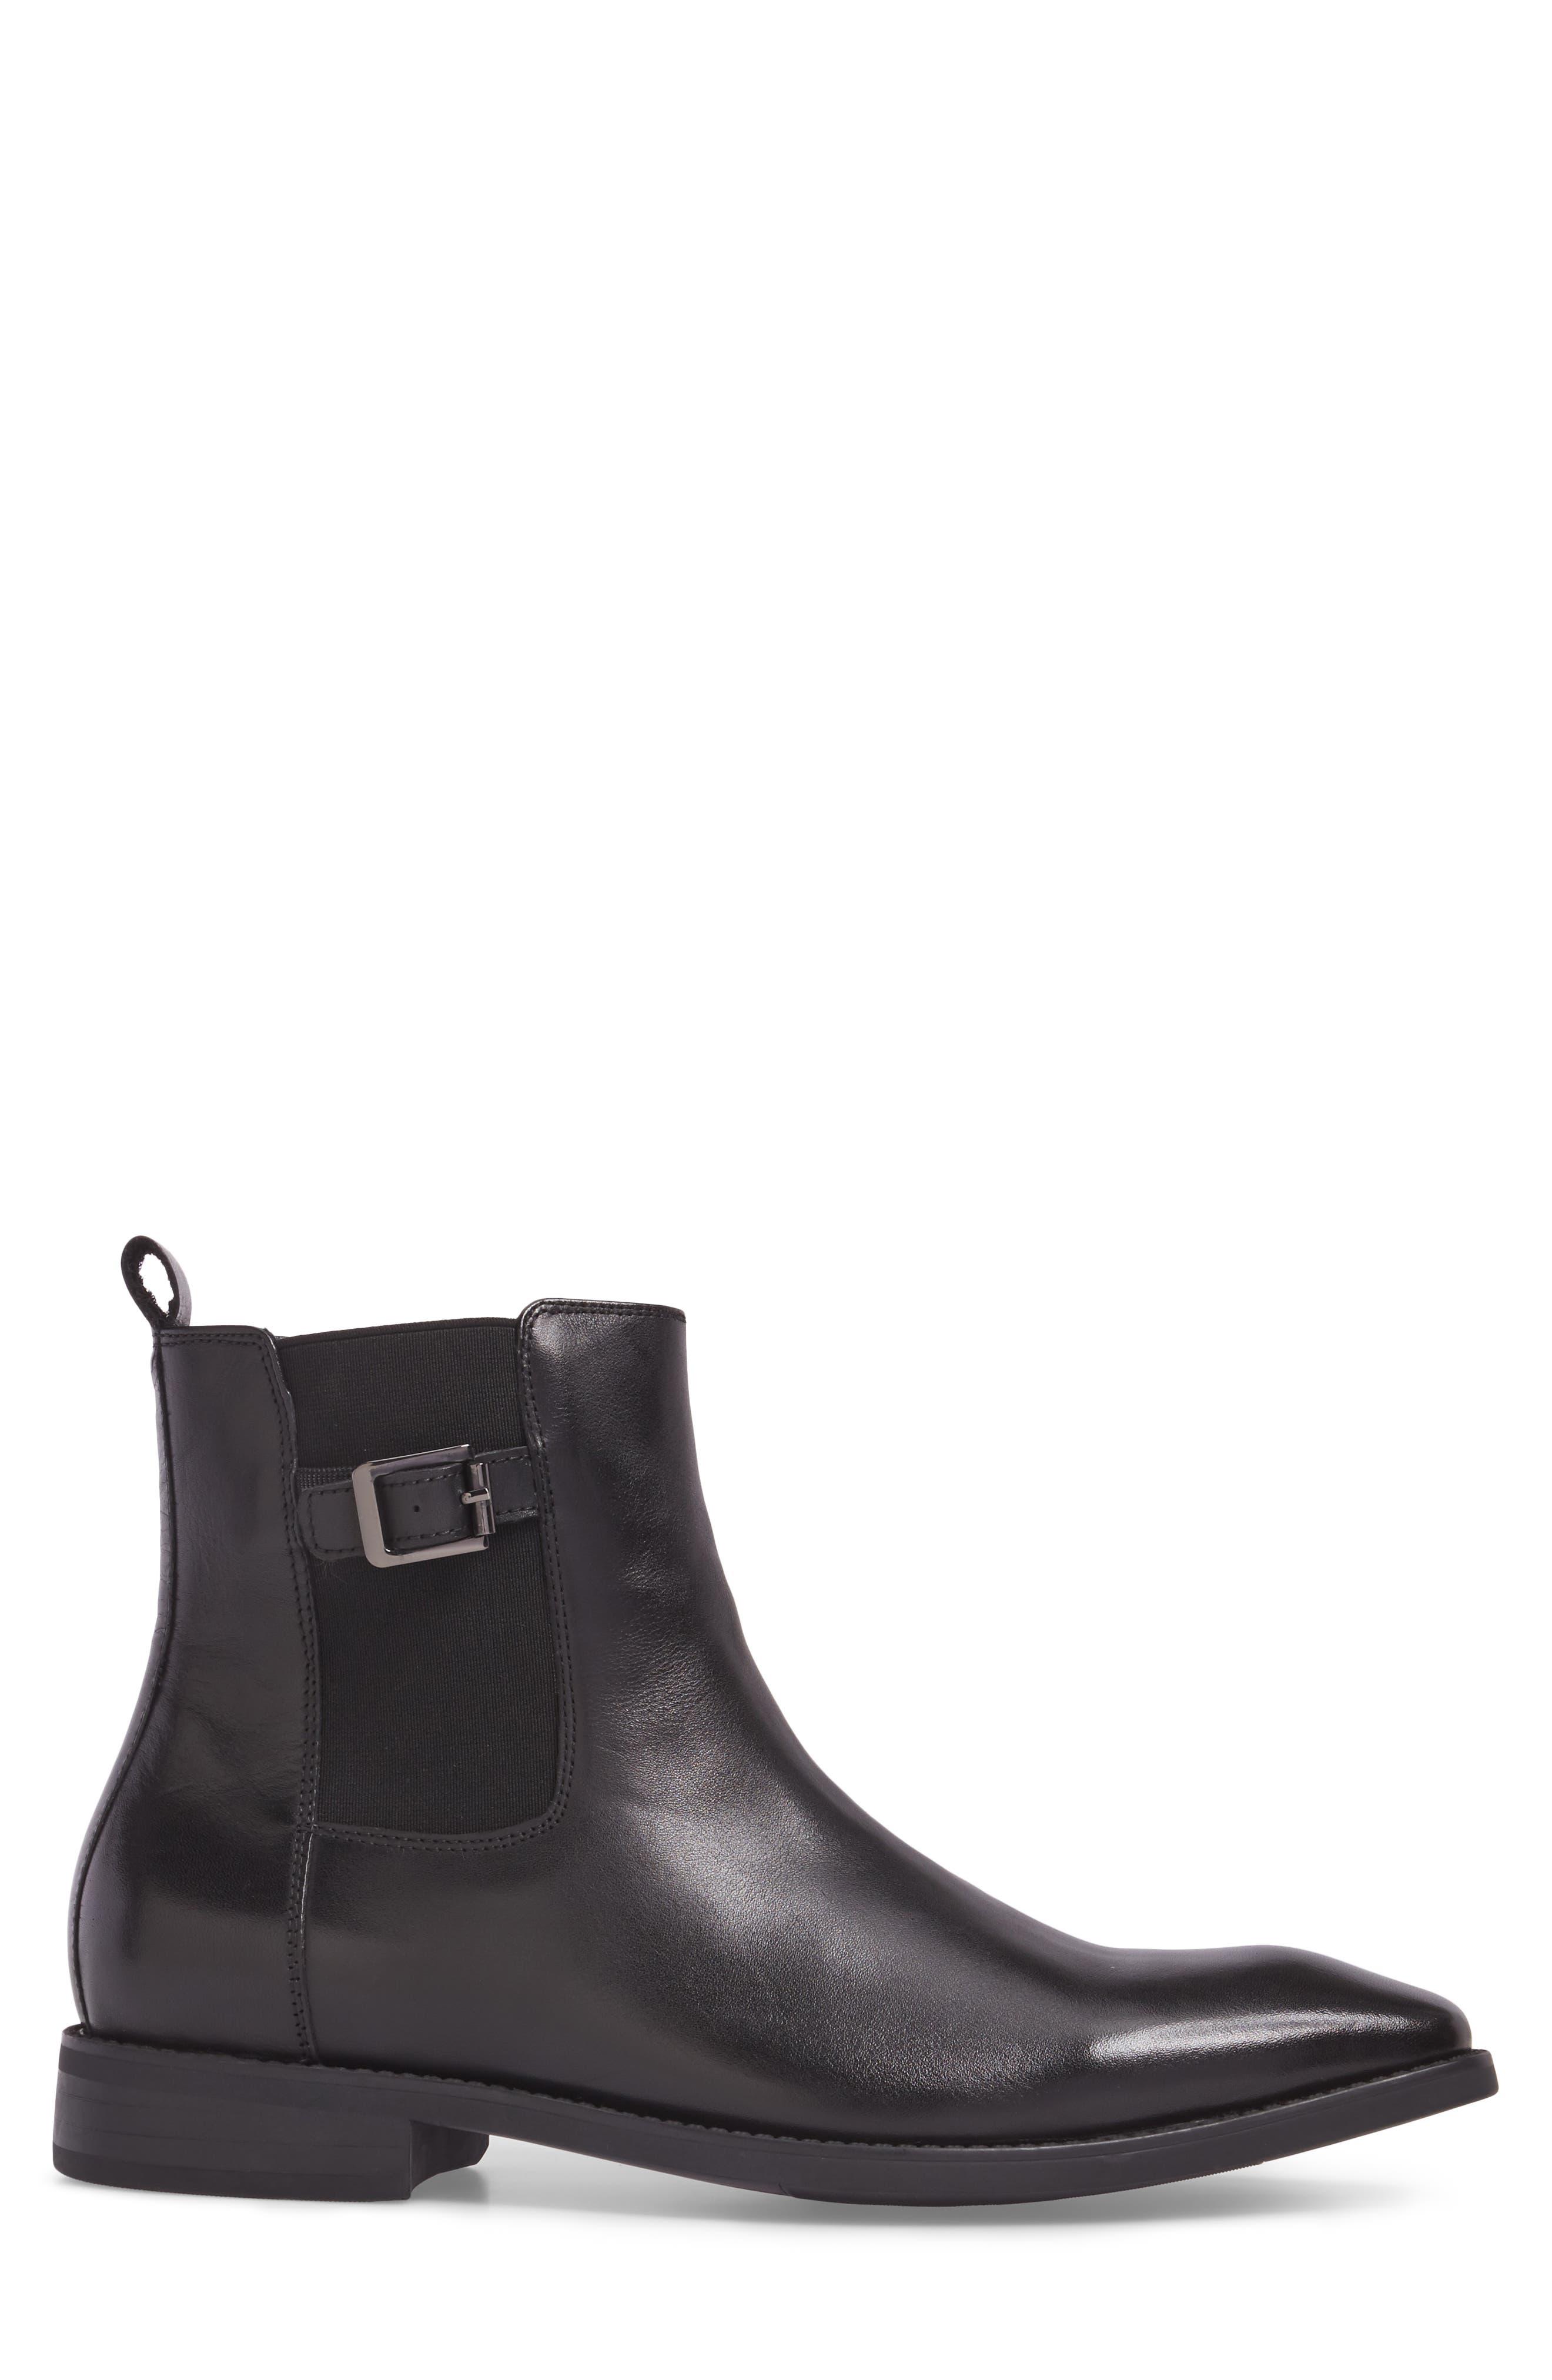 Loden Chelsea Boot,                             Alternate thumbnail 3, color,                             001